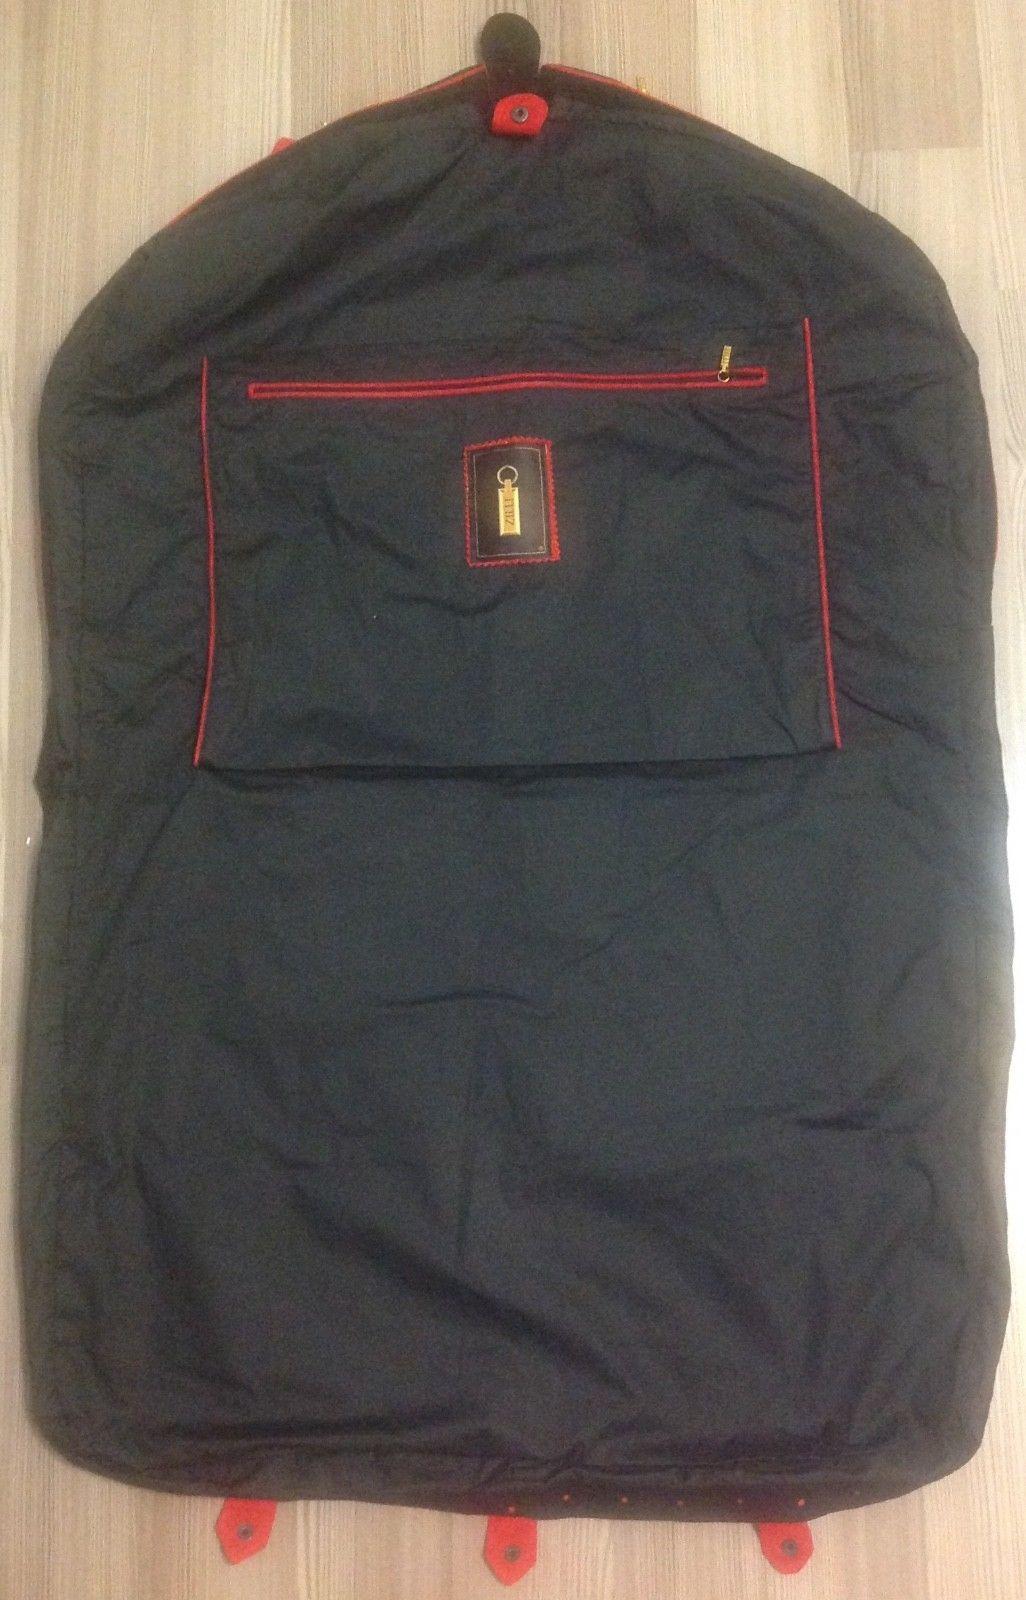 Zilli - garment bag #A - 02.jpg.jpg